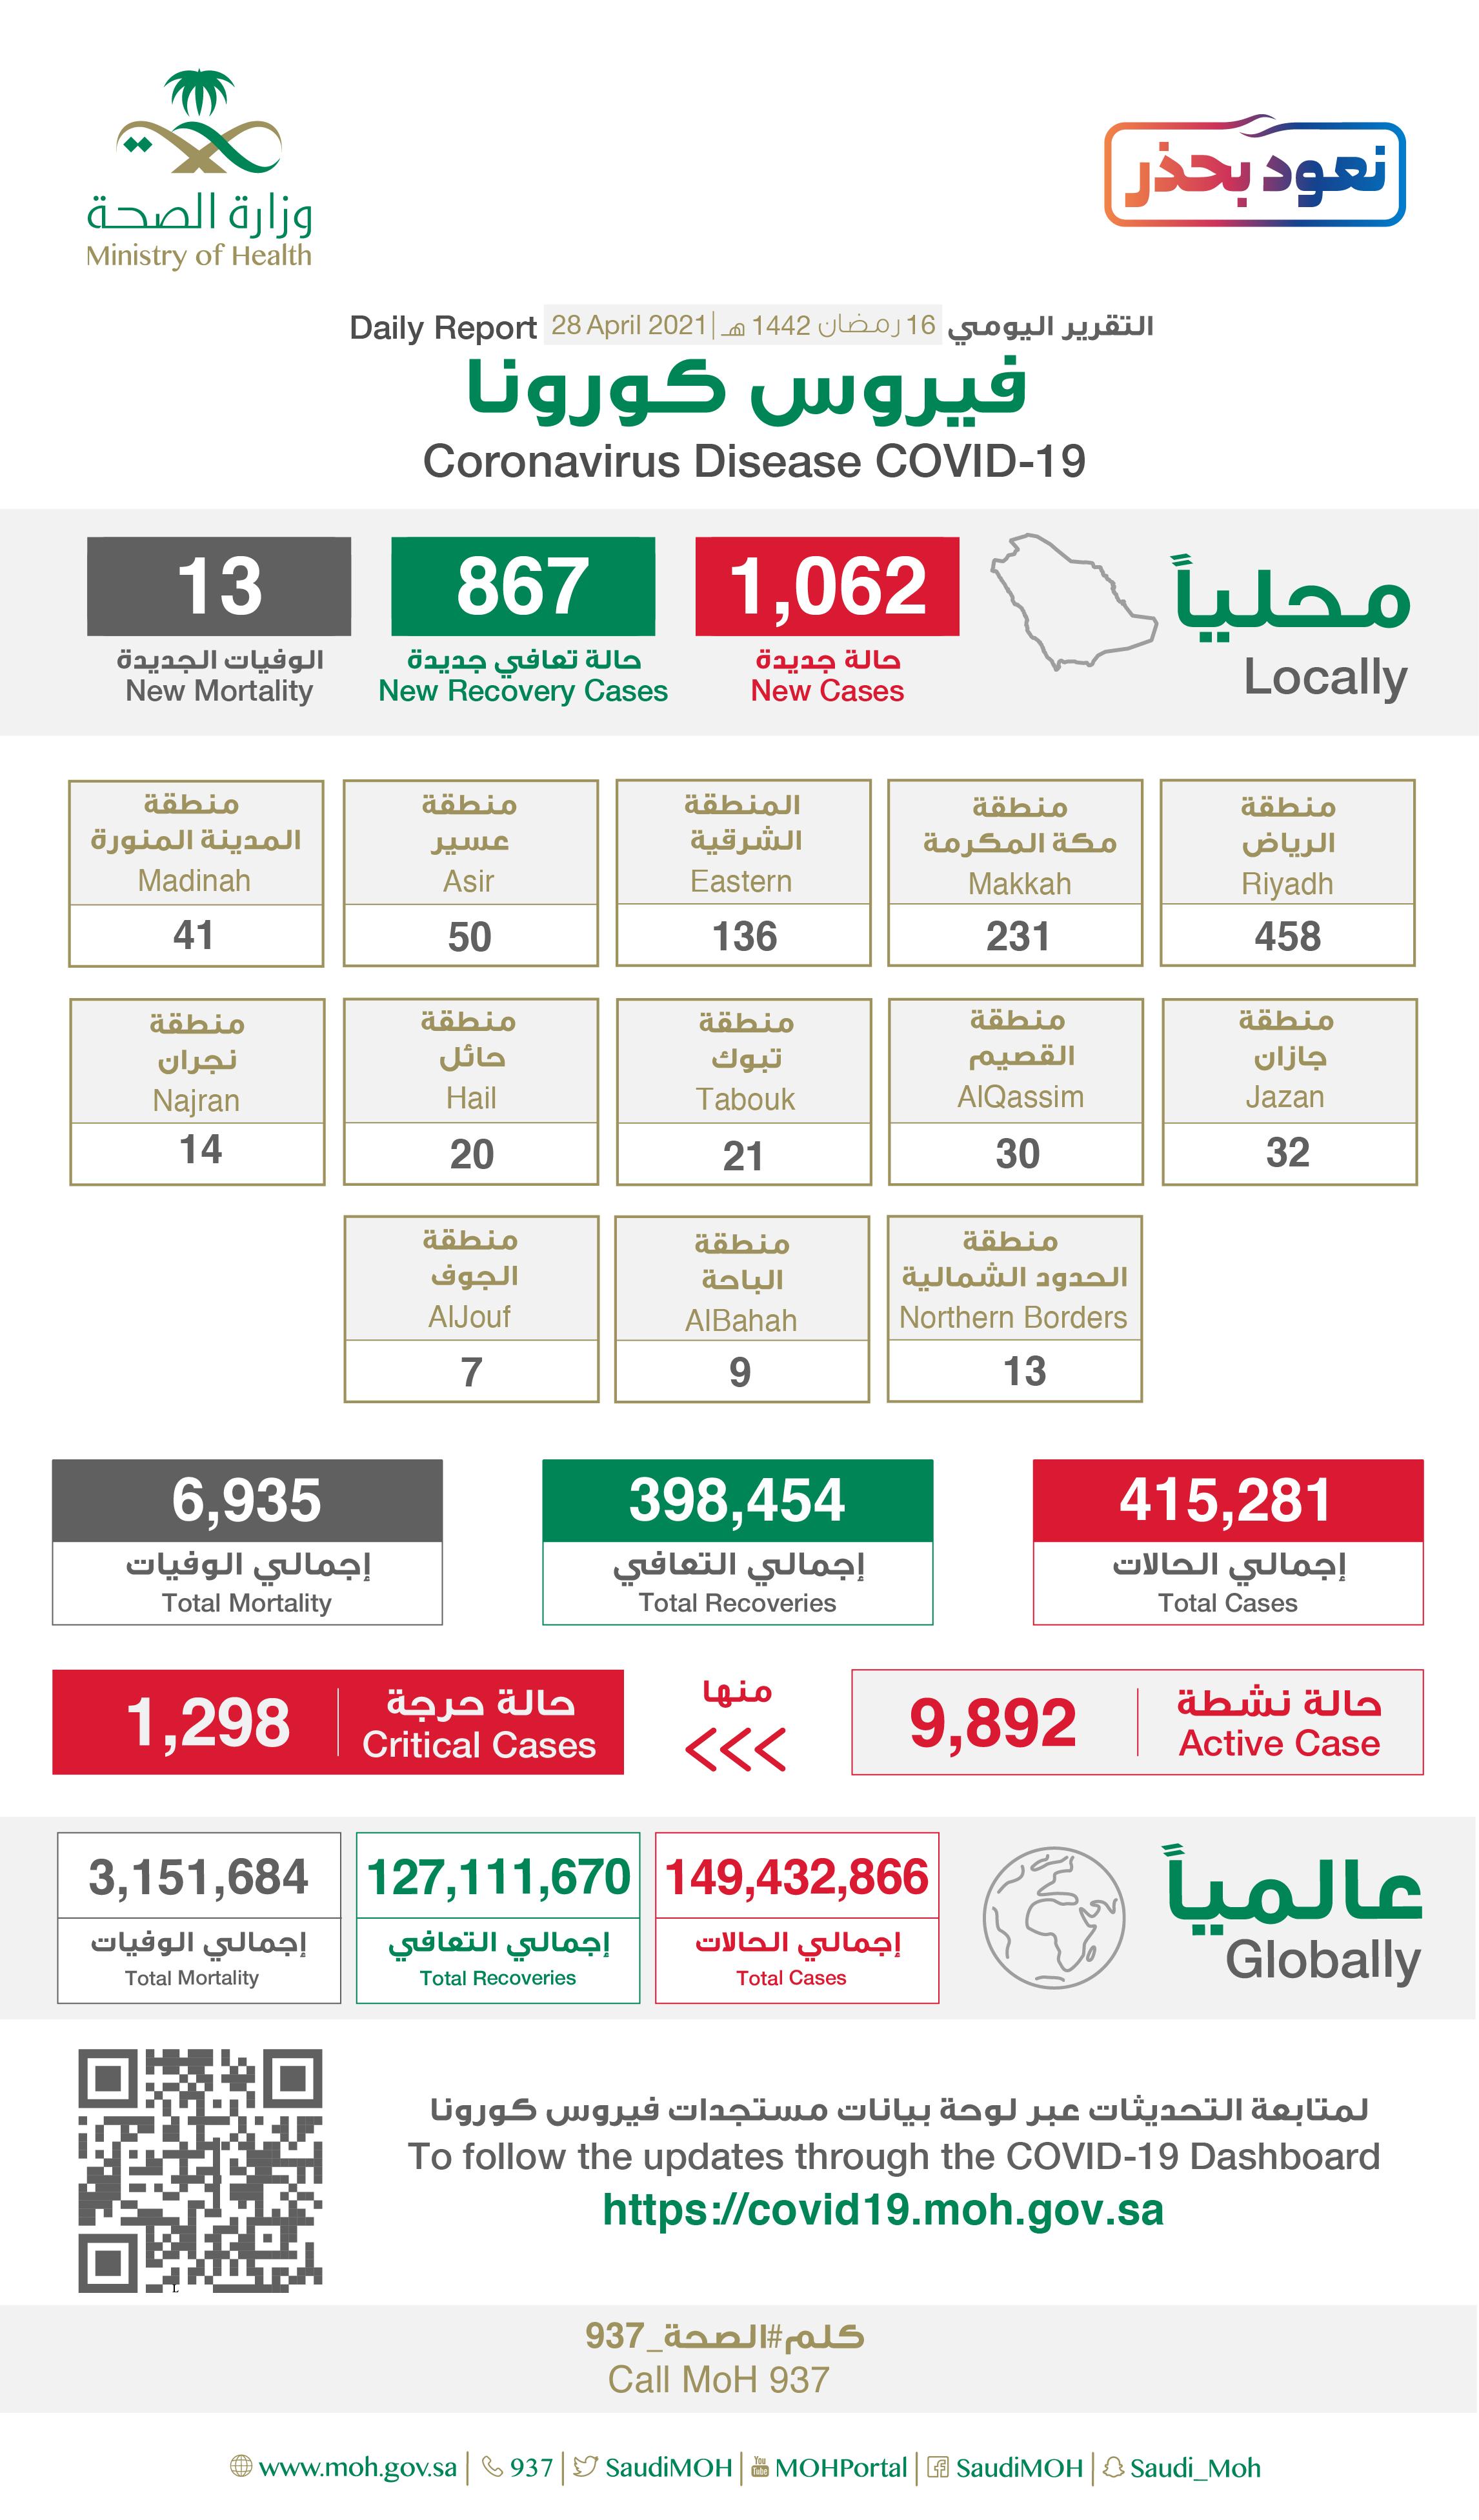 Saudi Arabia Coronavirus : Total Cases :415,281, New Cases : 1,062 , Cured : 398,454 , Deaths: 6,935, Active Cases : 9,892